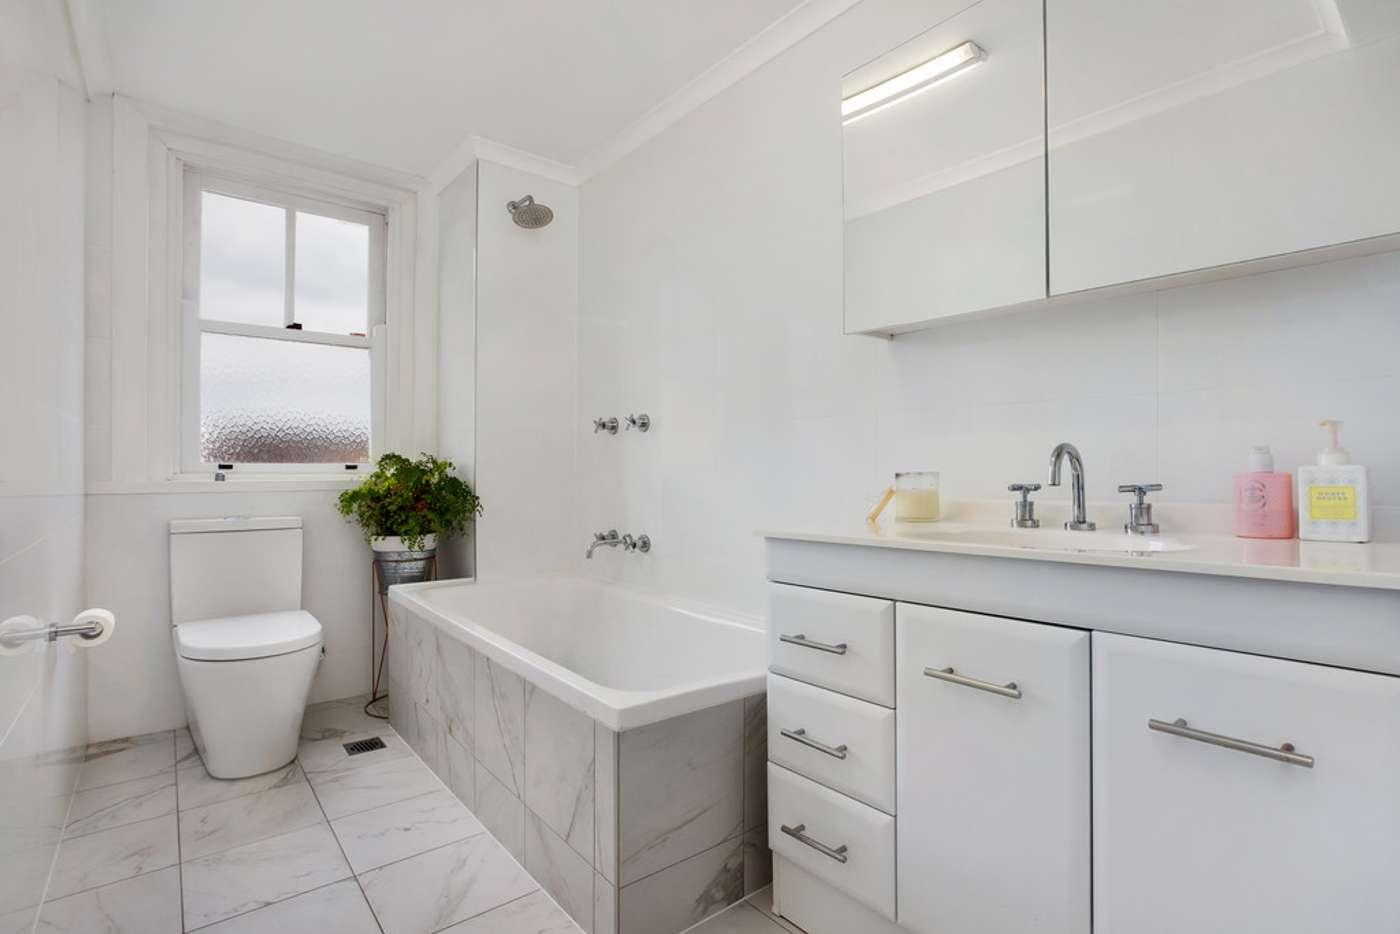 Sixth view of Homely apartment listing, 48/1 Beach Road, Bondi Beach NSW 2026